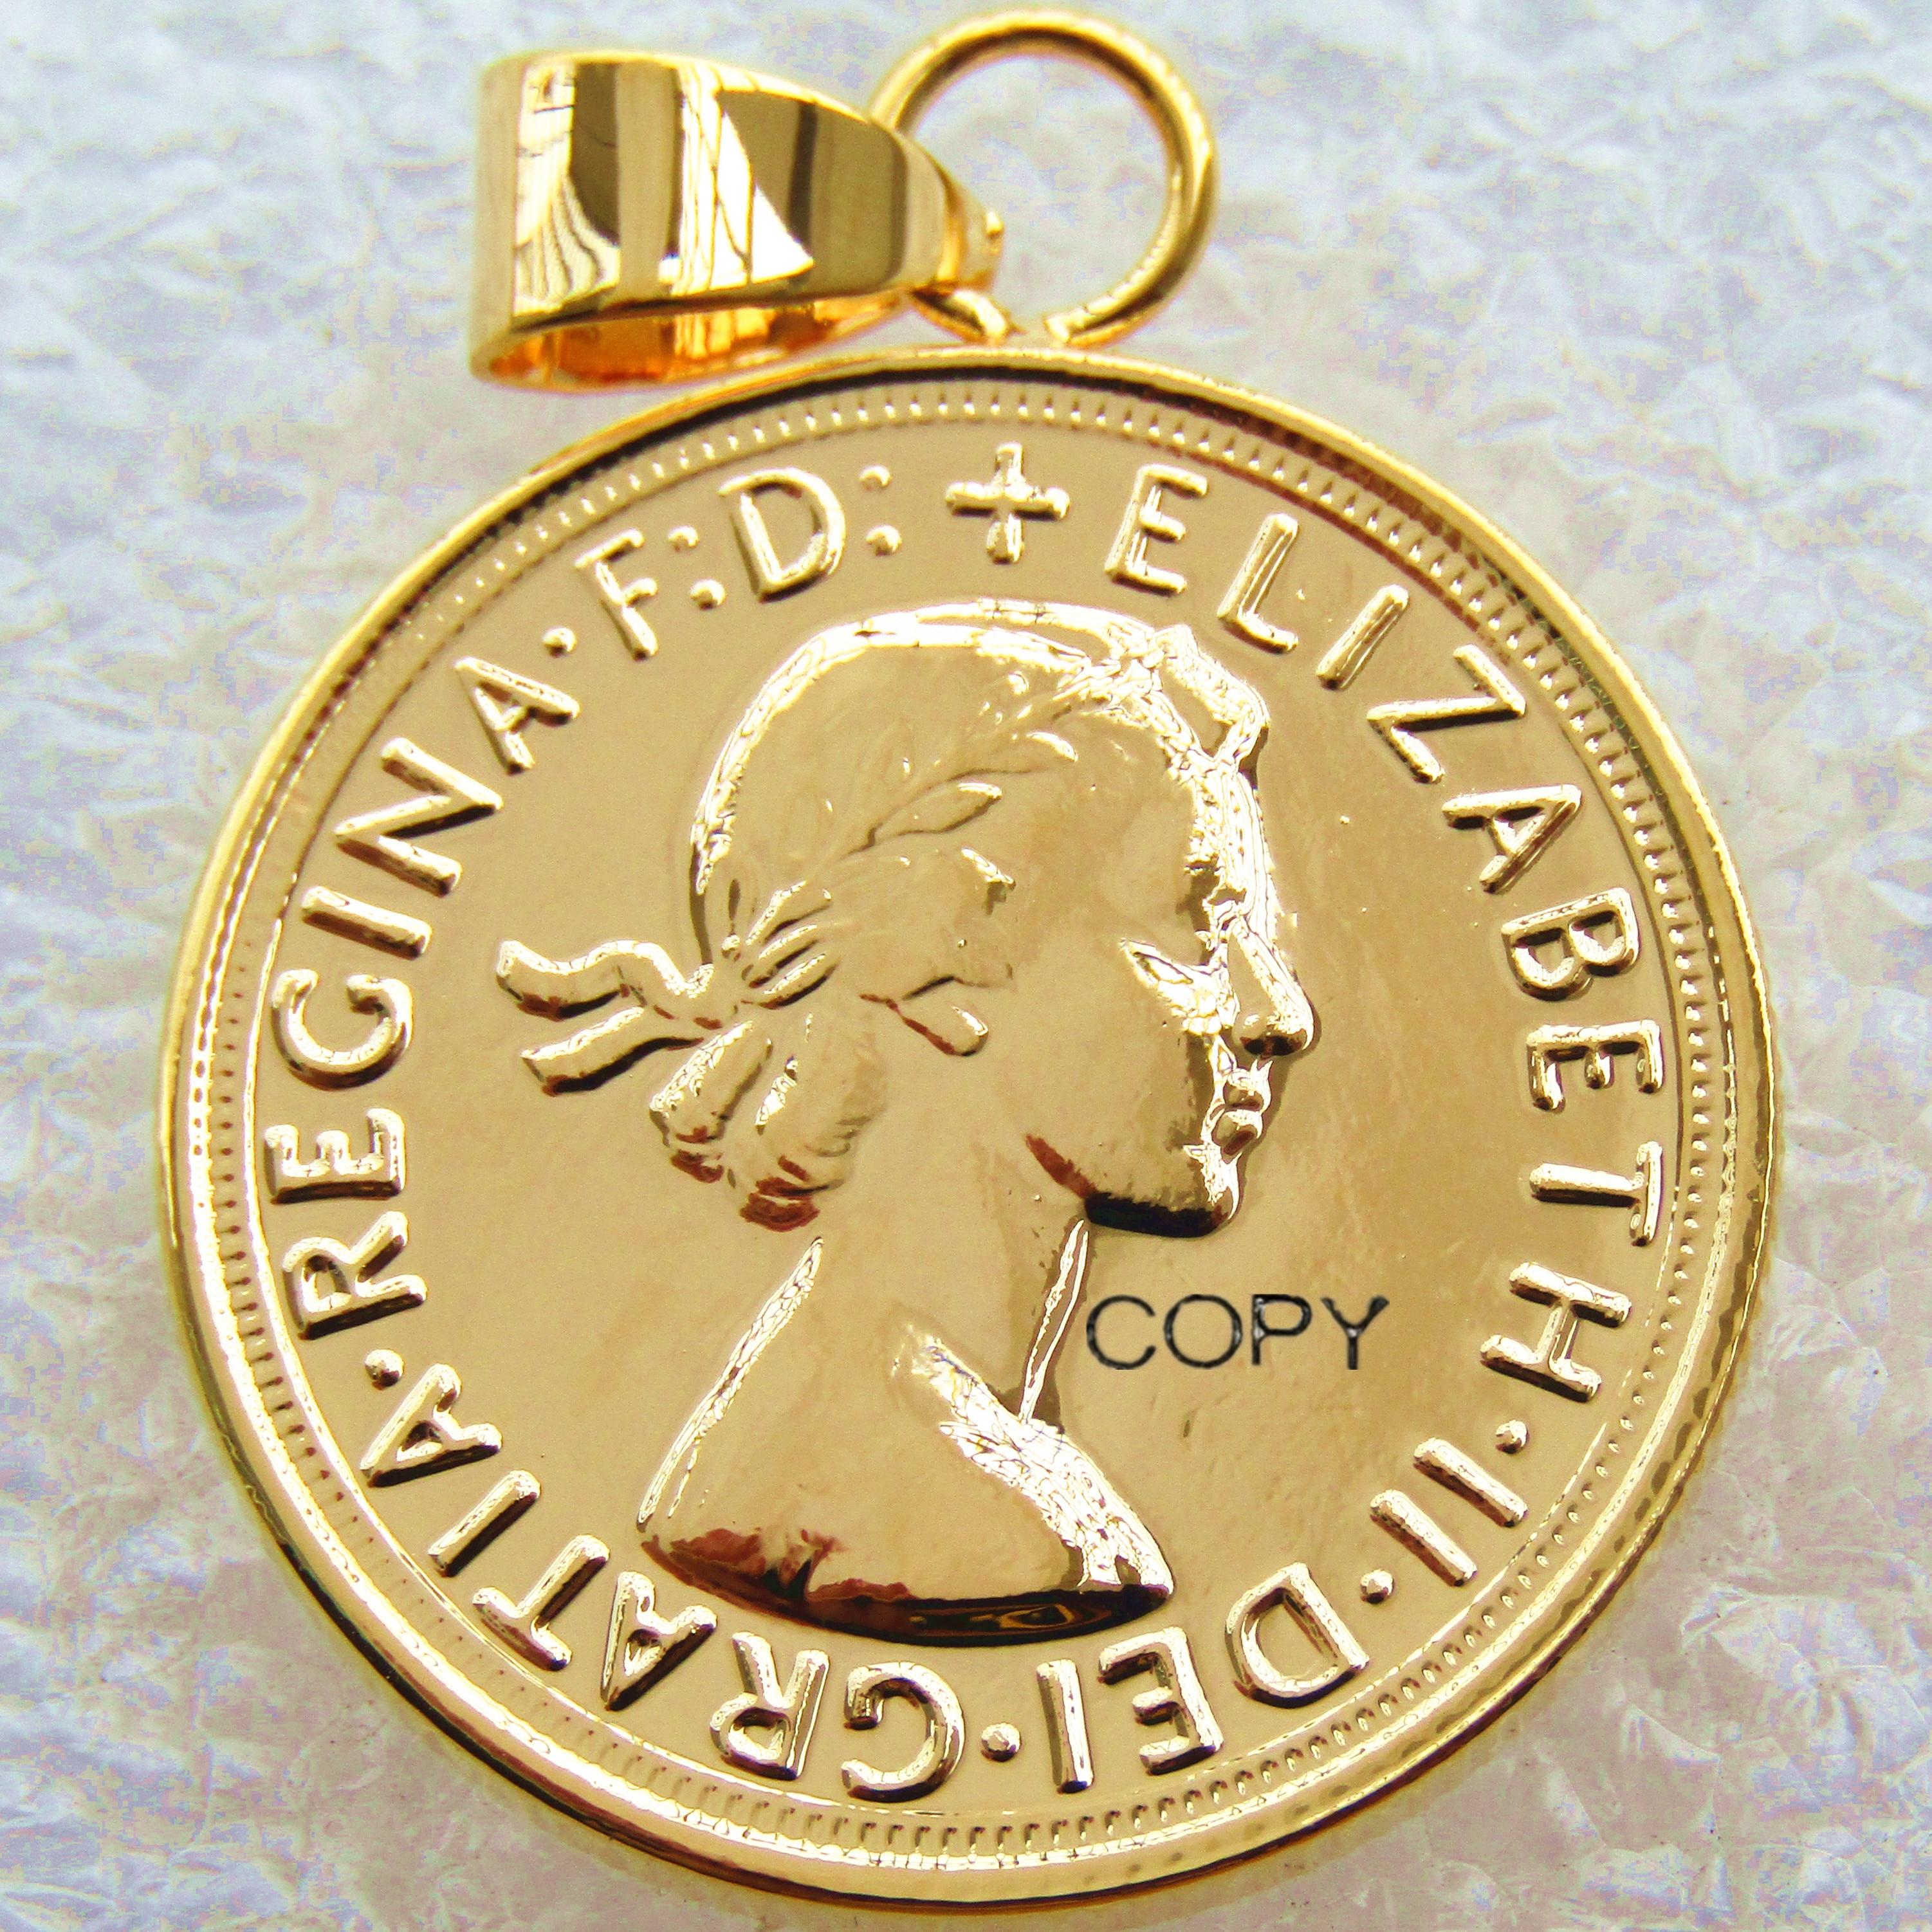 P(24) pingente de moeda 1964 regina fd elizabeth ii dei gratia banhado a ouro 1 moedas de cópia soberana (diâmetro: 22mm)